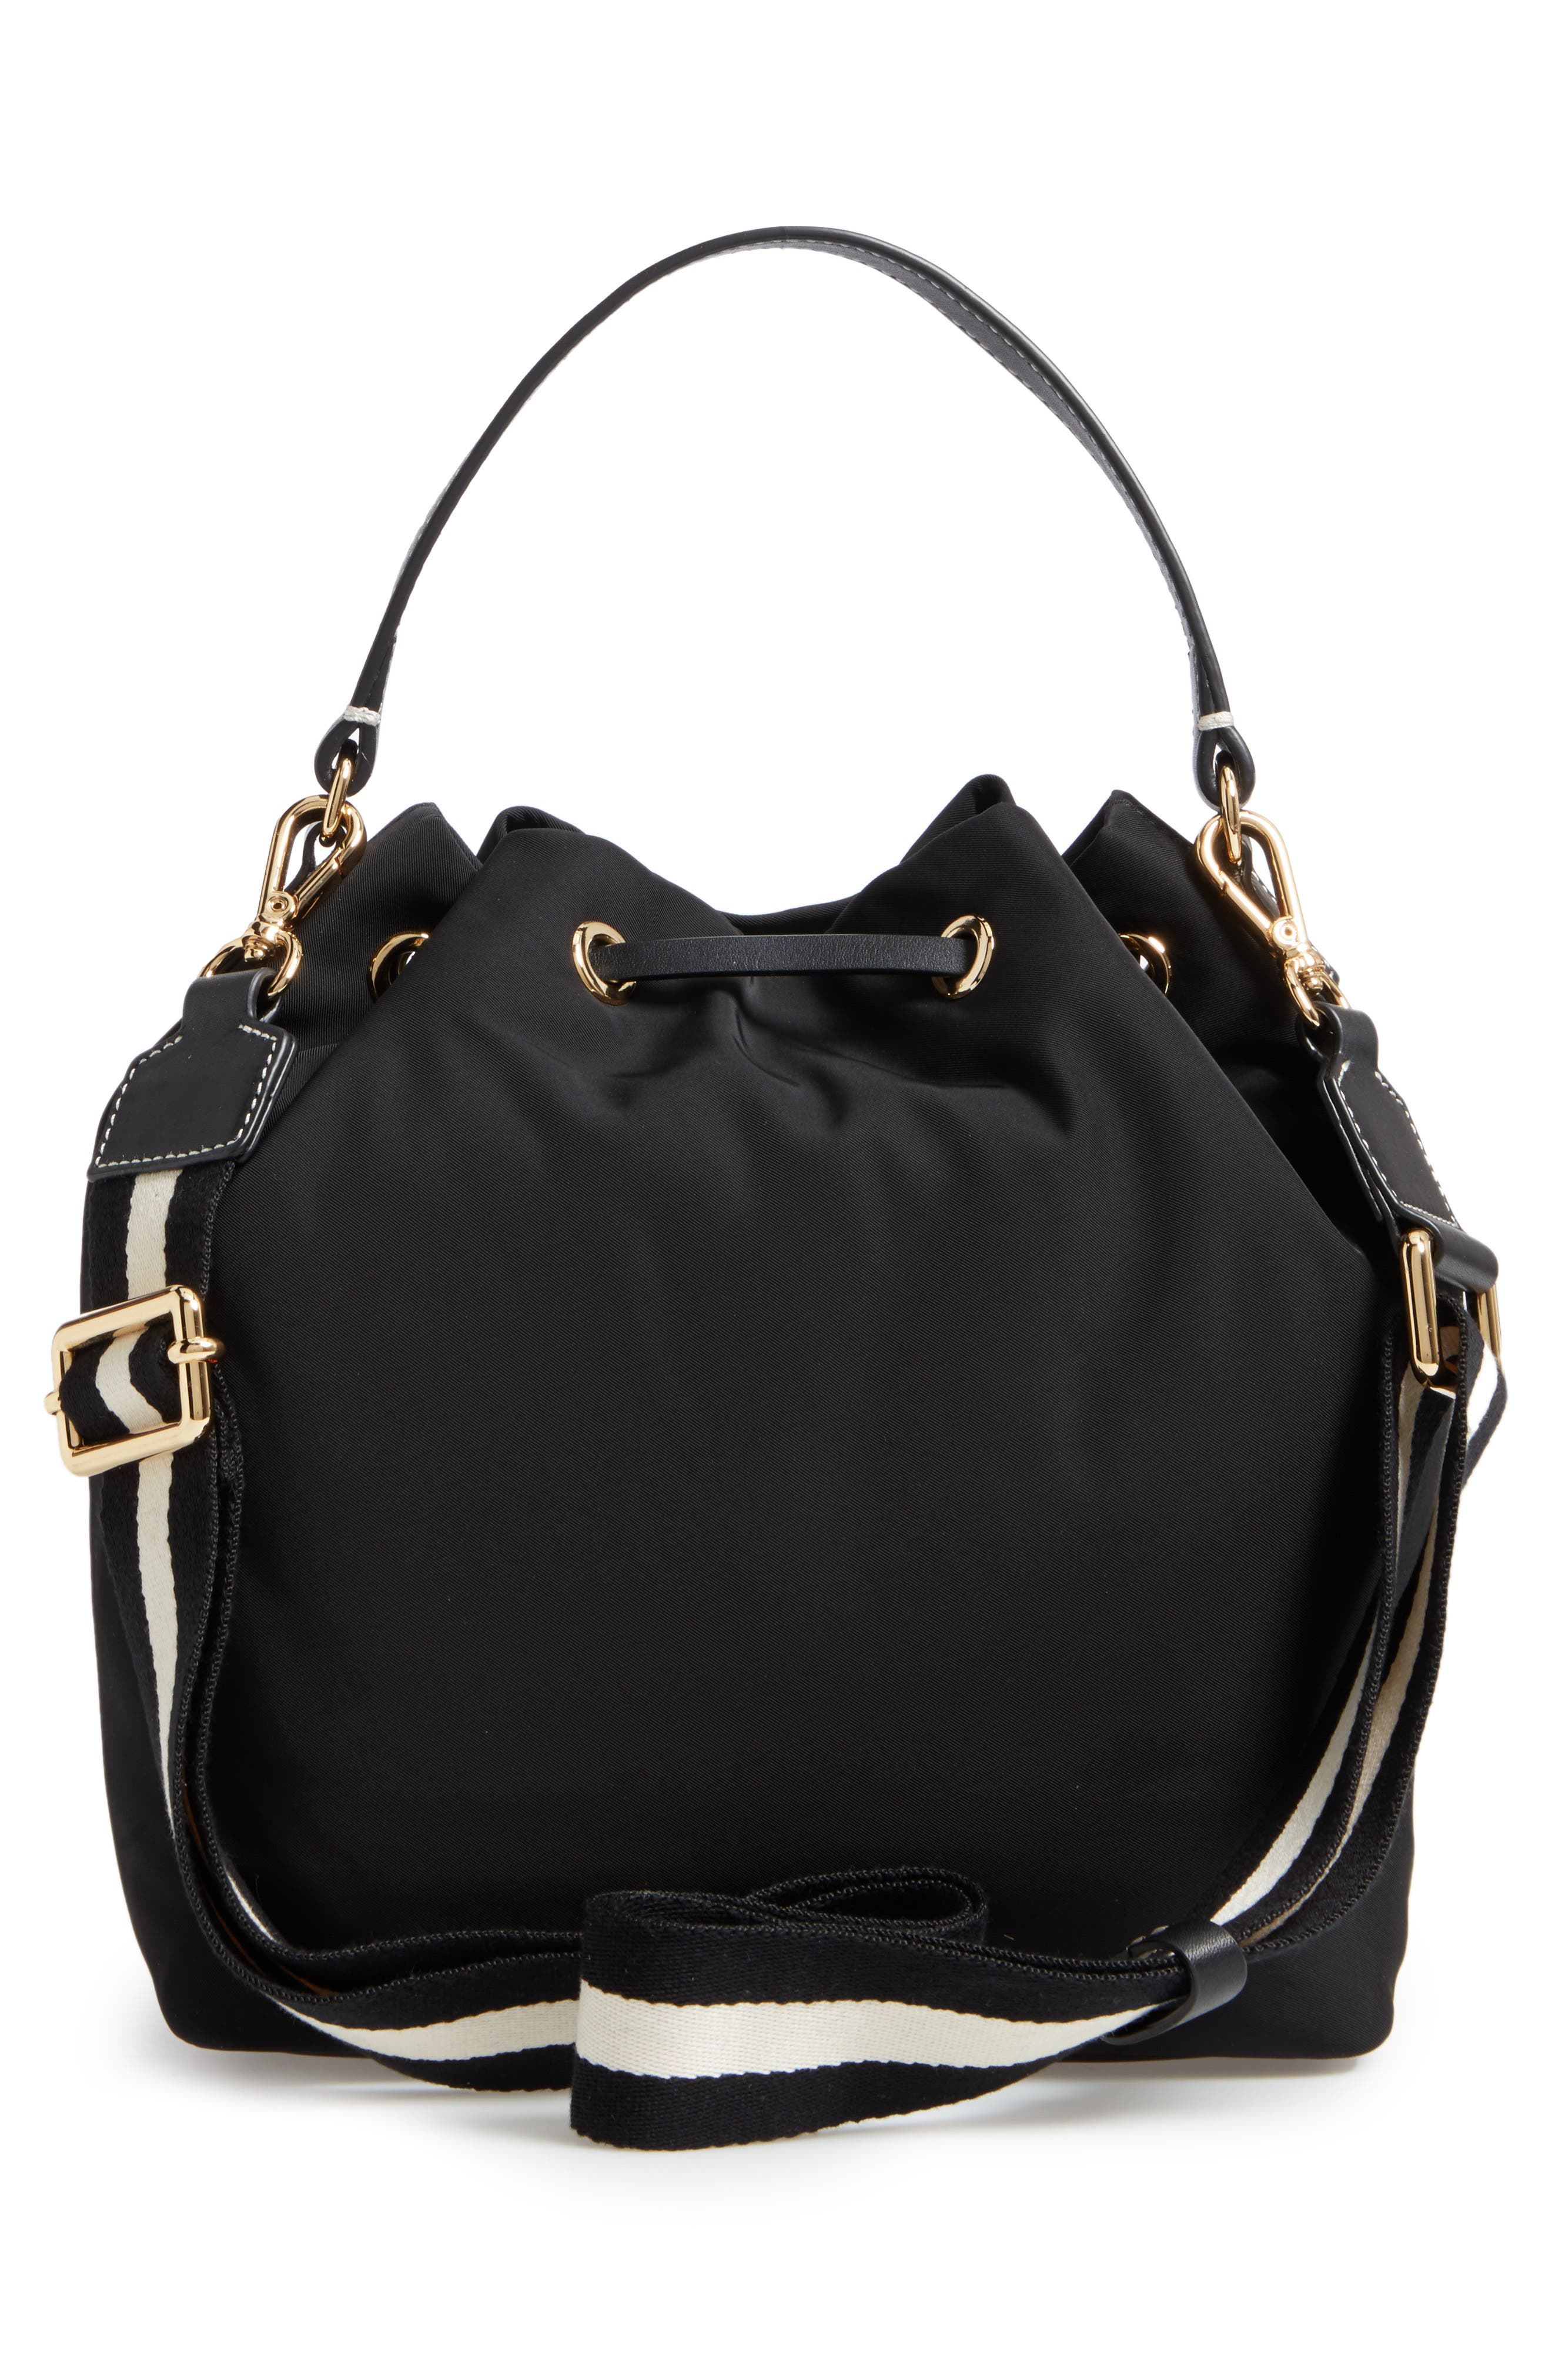 Medium Ann Nylon Bucket Bag,                             Alternate thumbnail 5, color,